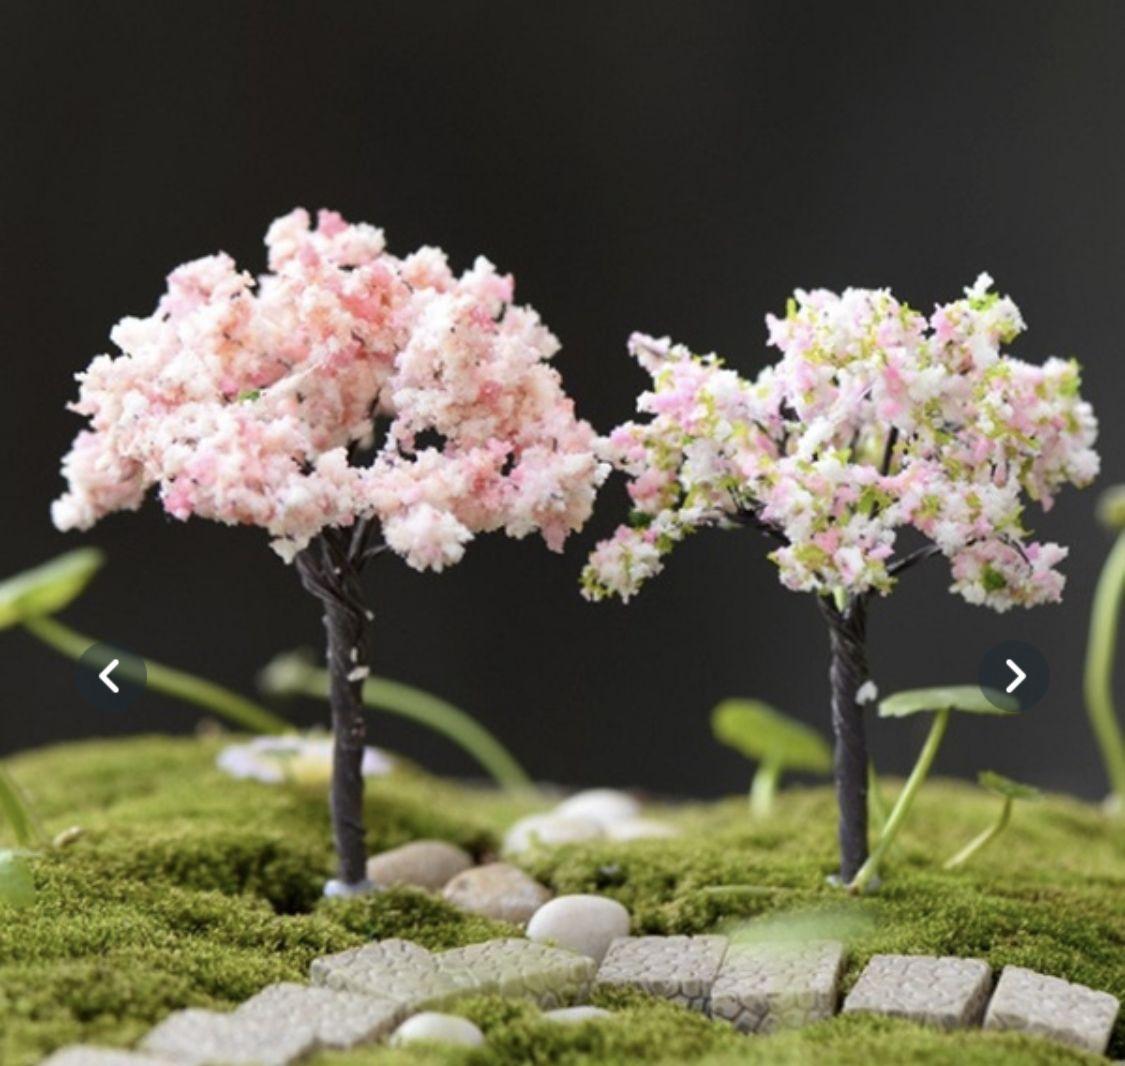 Pin By Salma Ghayal On Fairy Garden Fairy Garden Ornaments Miniature Fairy Gardens Artificial Cherry Blossom Tree